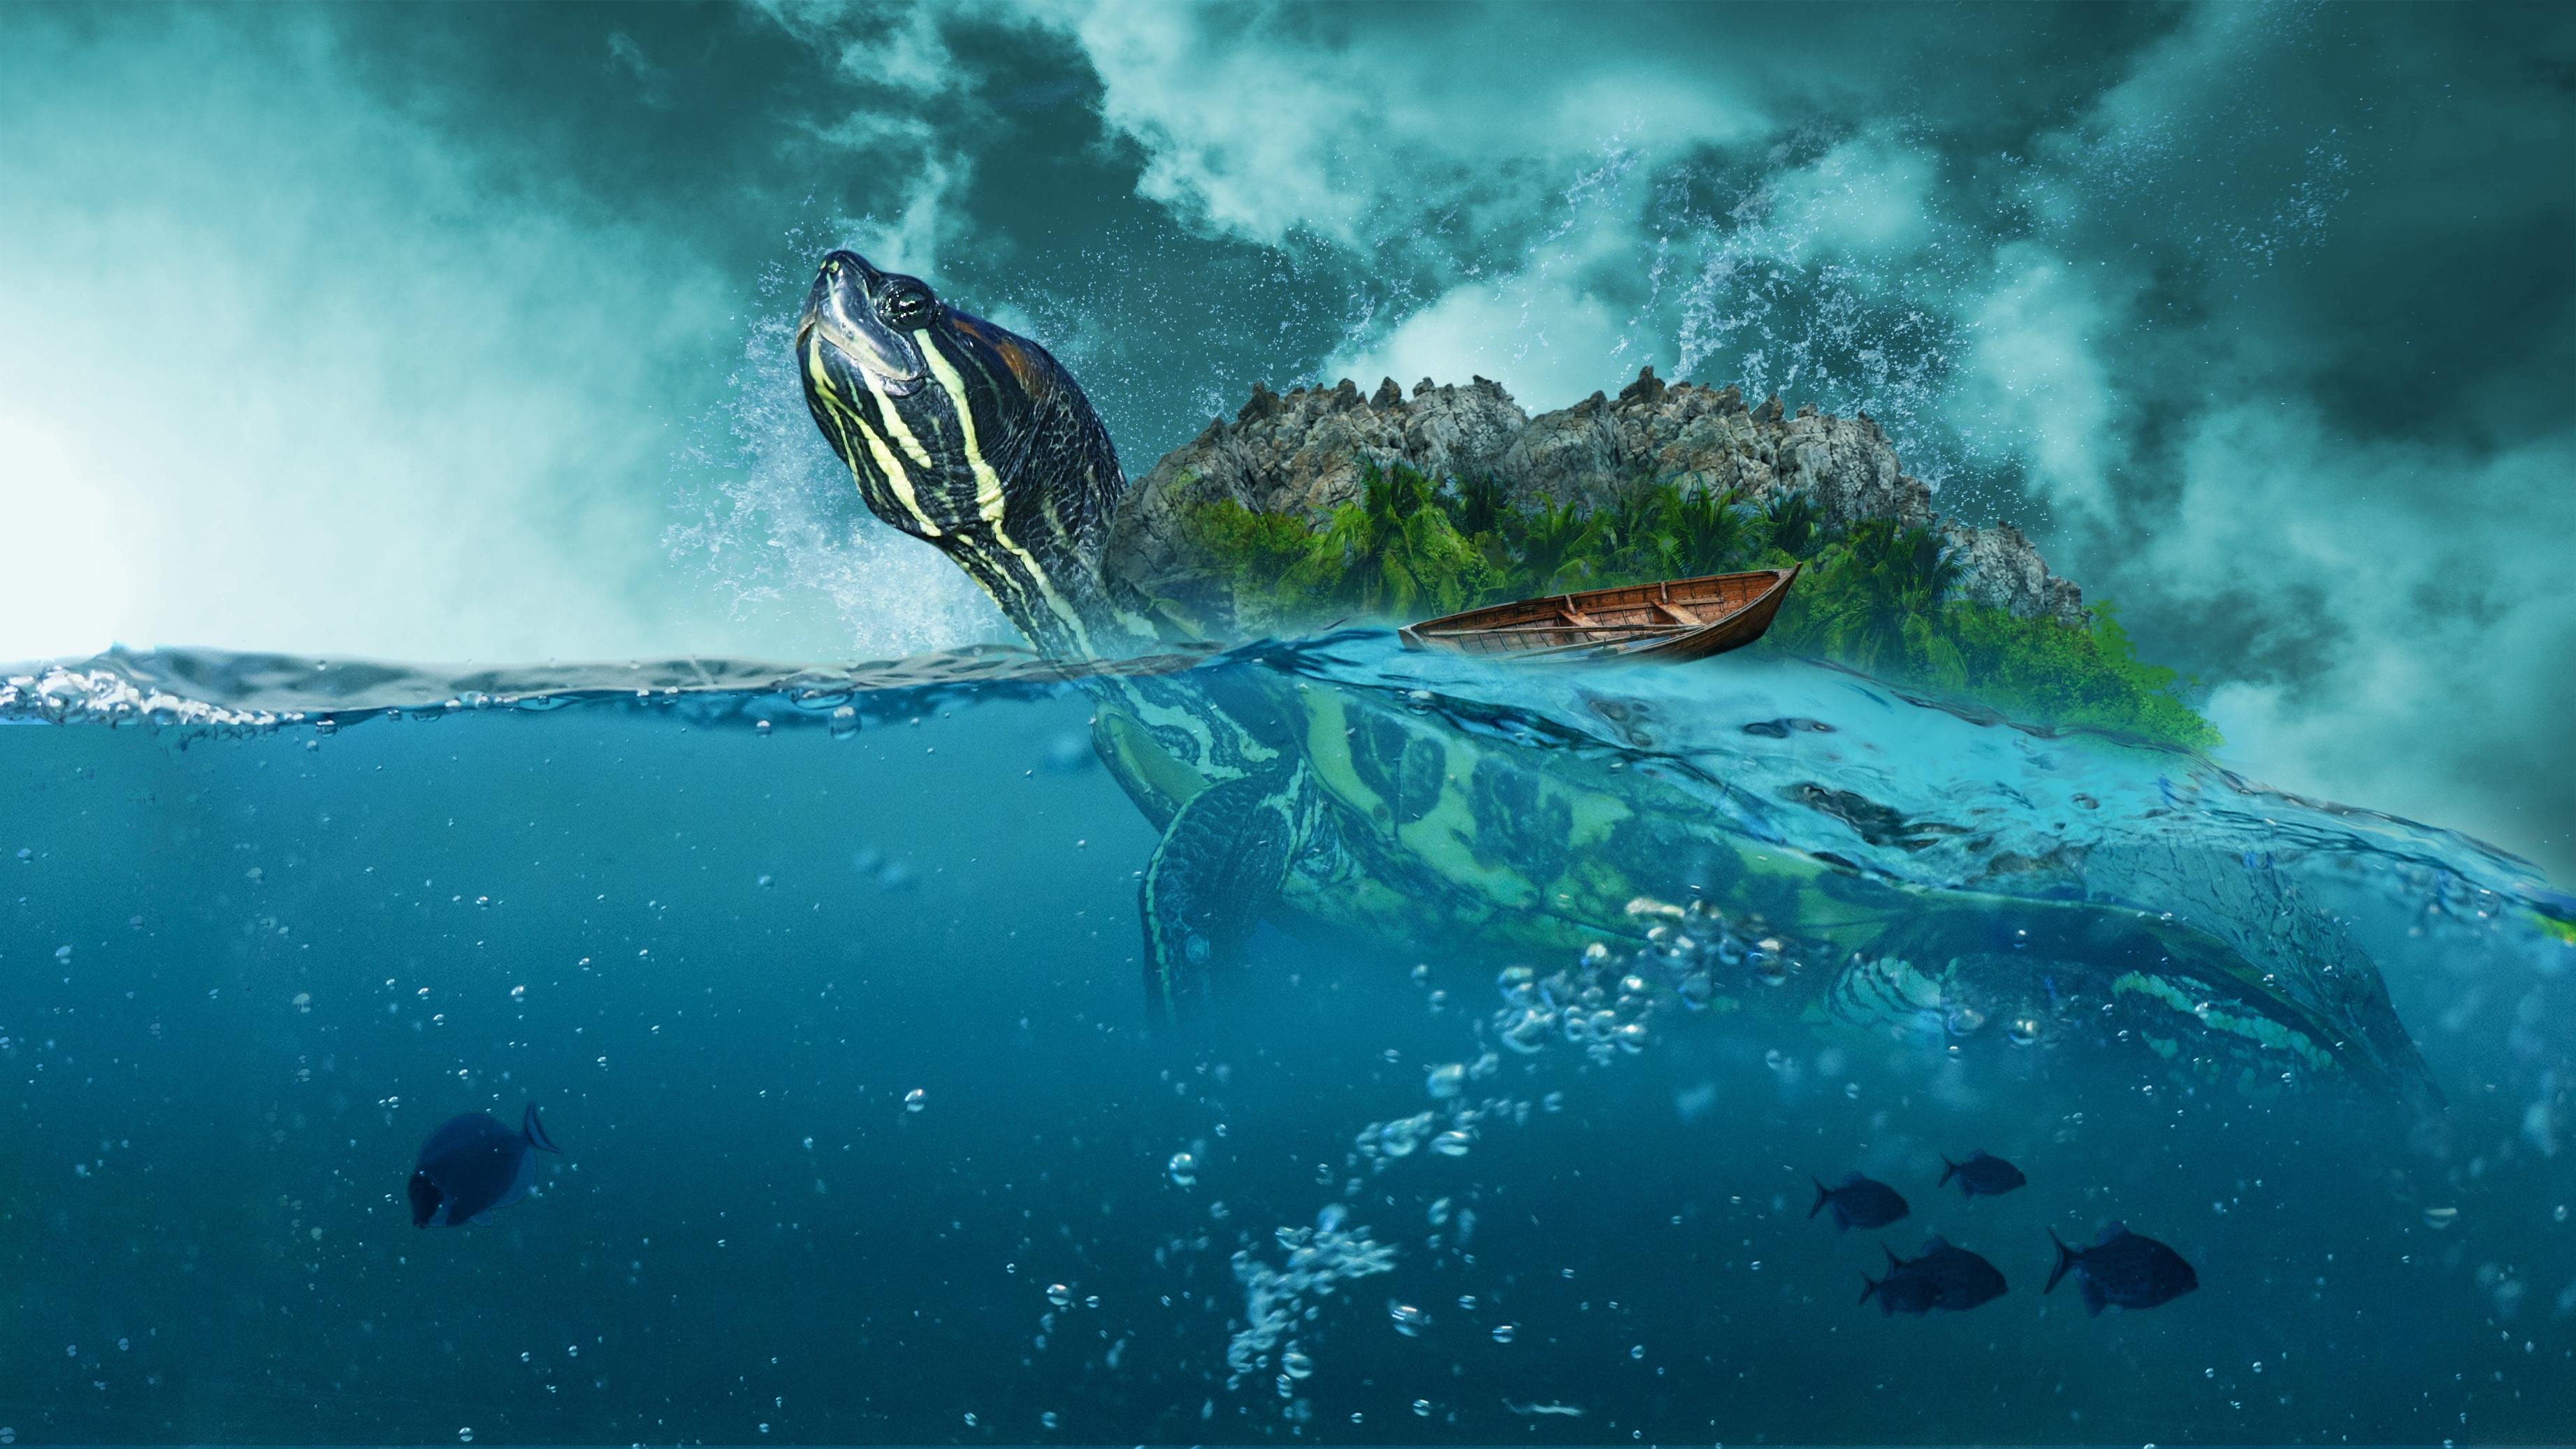 Sea Creature, Ocean, Sea, Water, Nature, HQ Photo